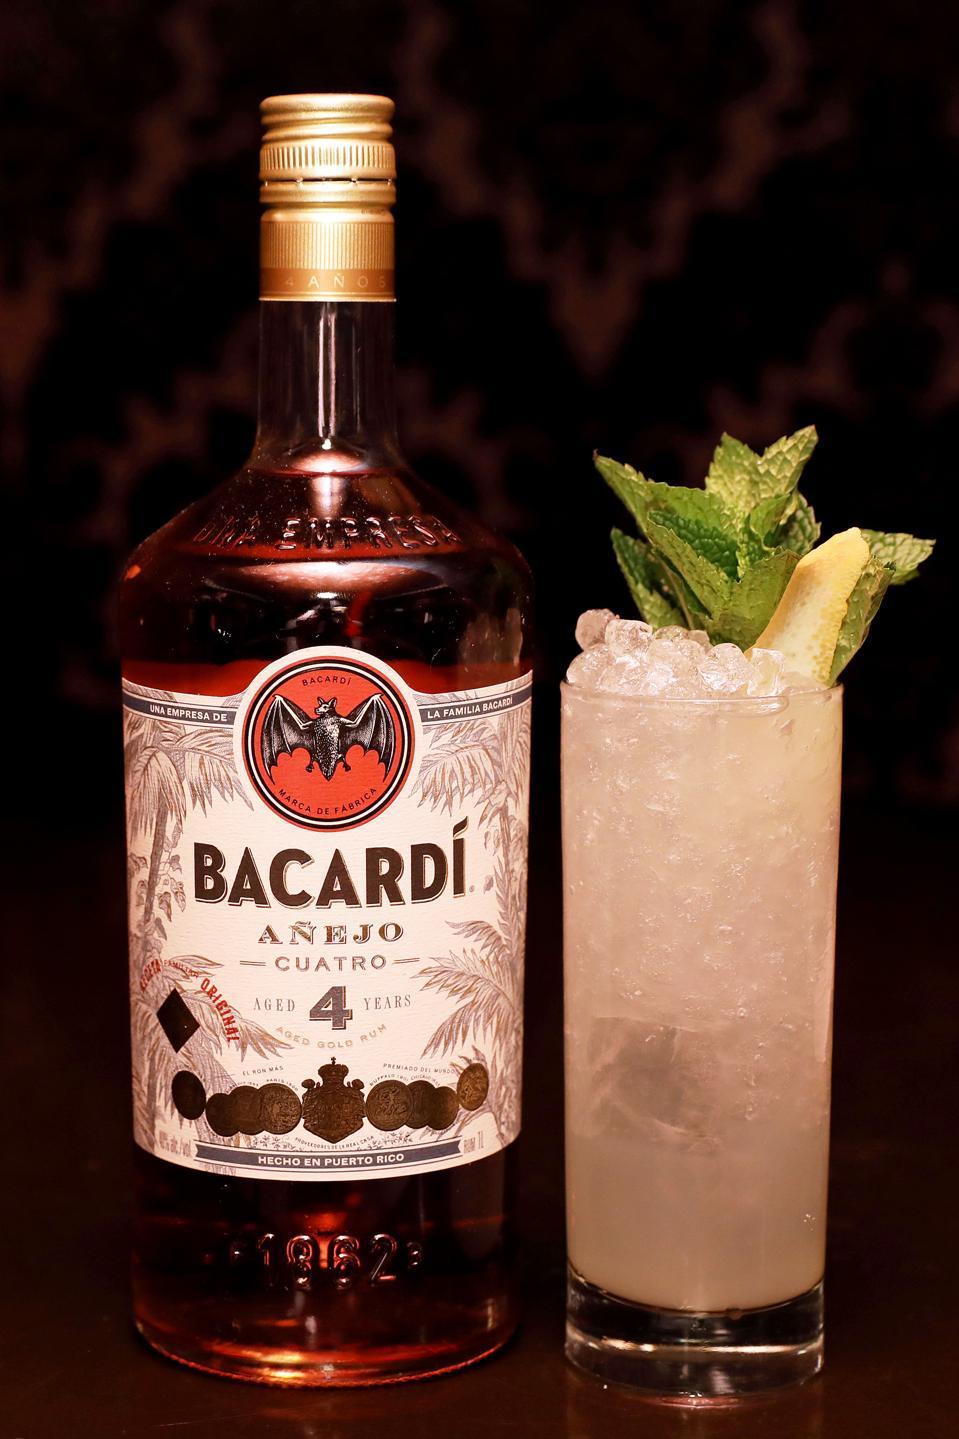 Bacardi Marketing Strategy